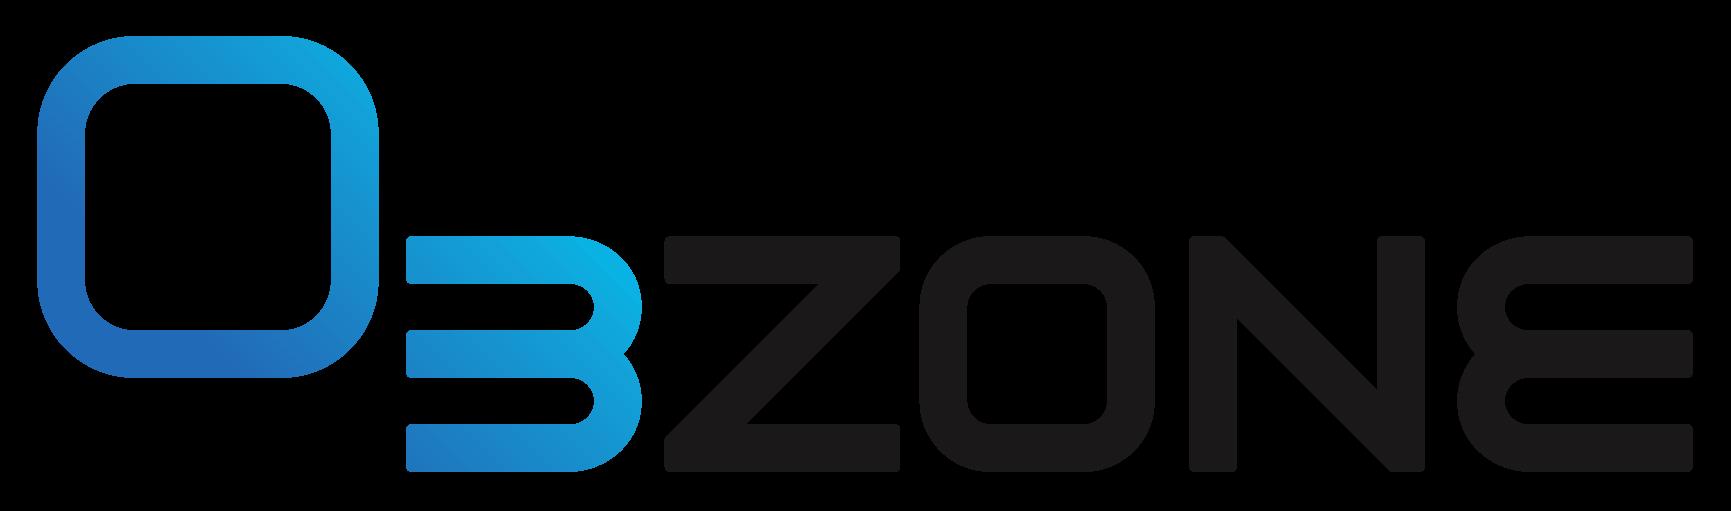 o3zone